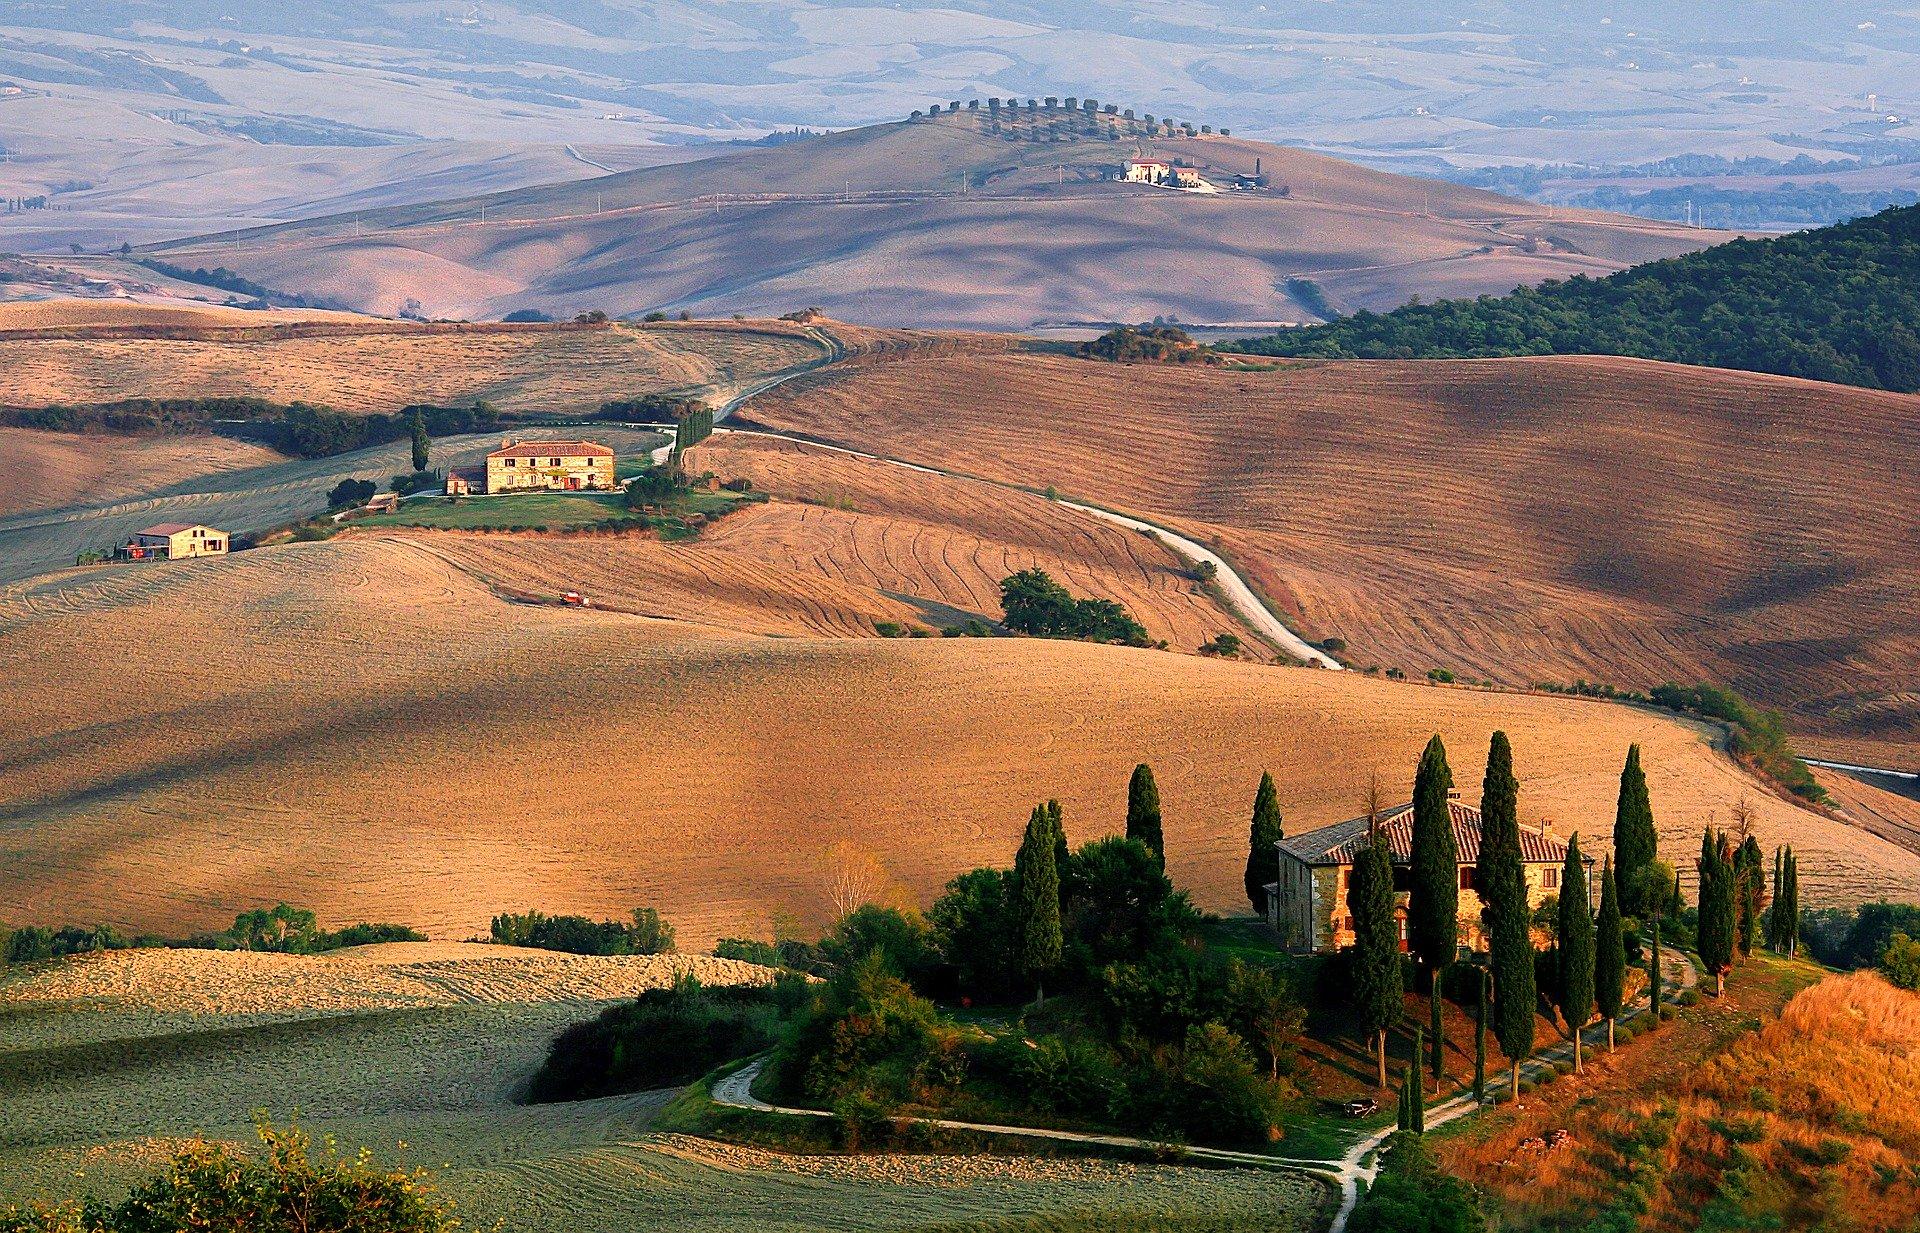 tuscany-1707192_1920.jpg